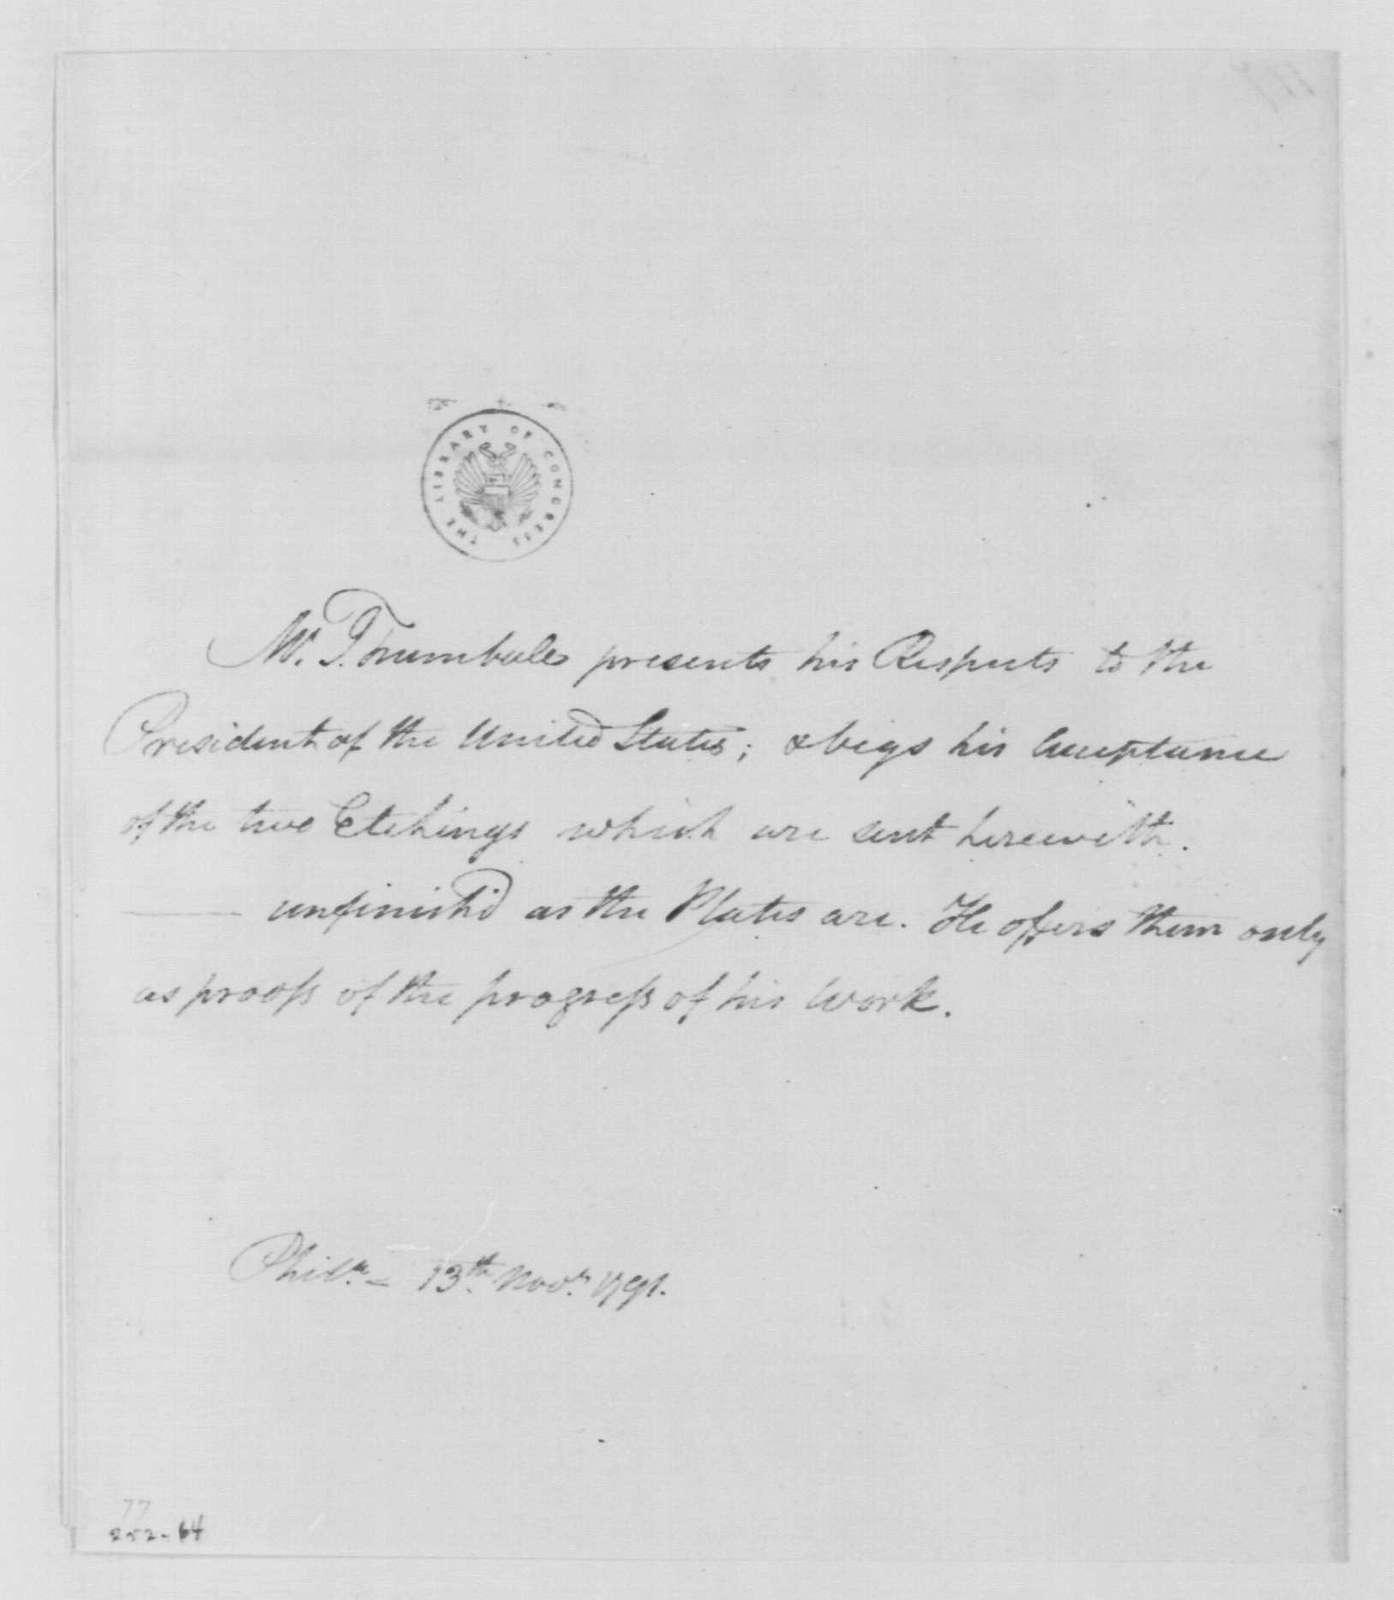 George Washington Papers, Series 4, General Correspondence: John Trumbull to George Washington, November 13, 1791